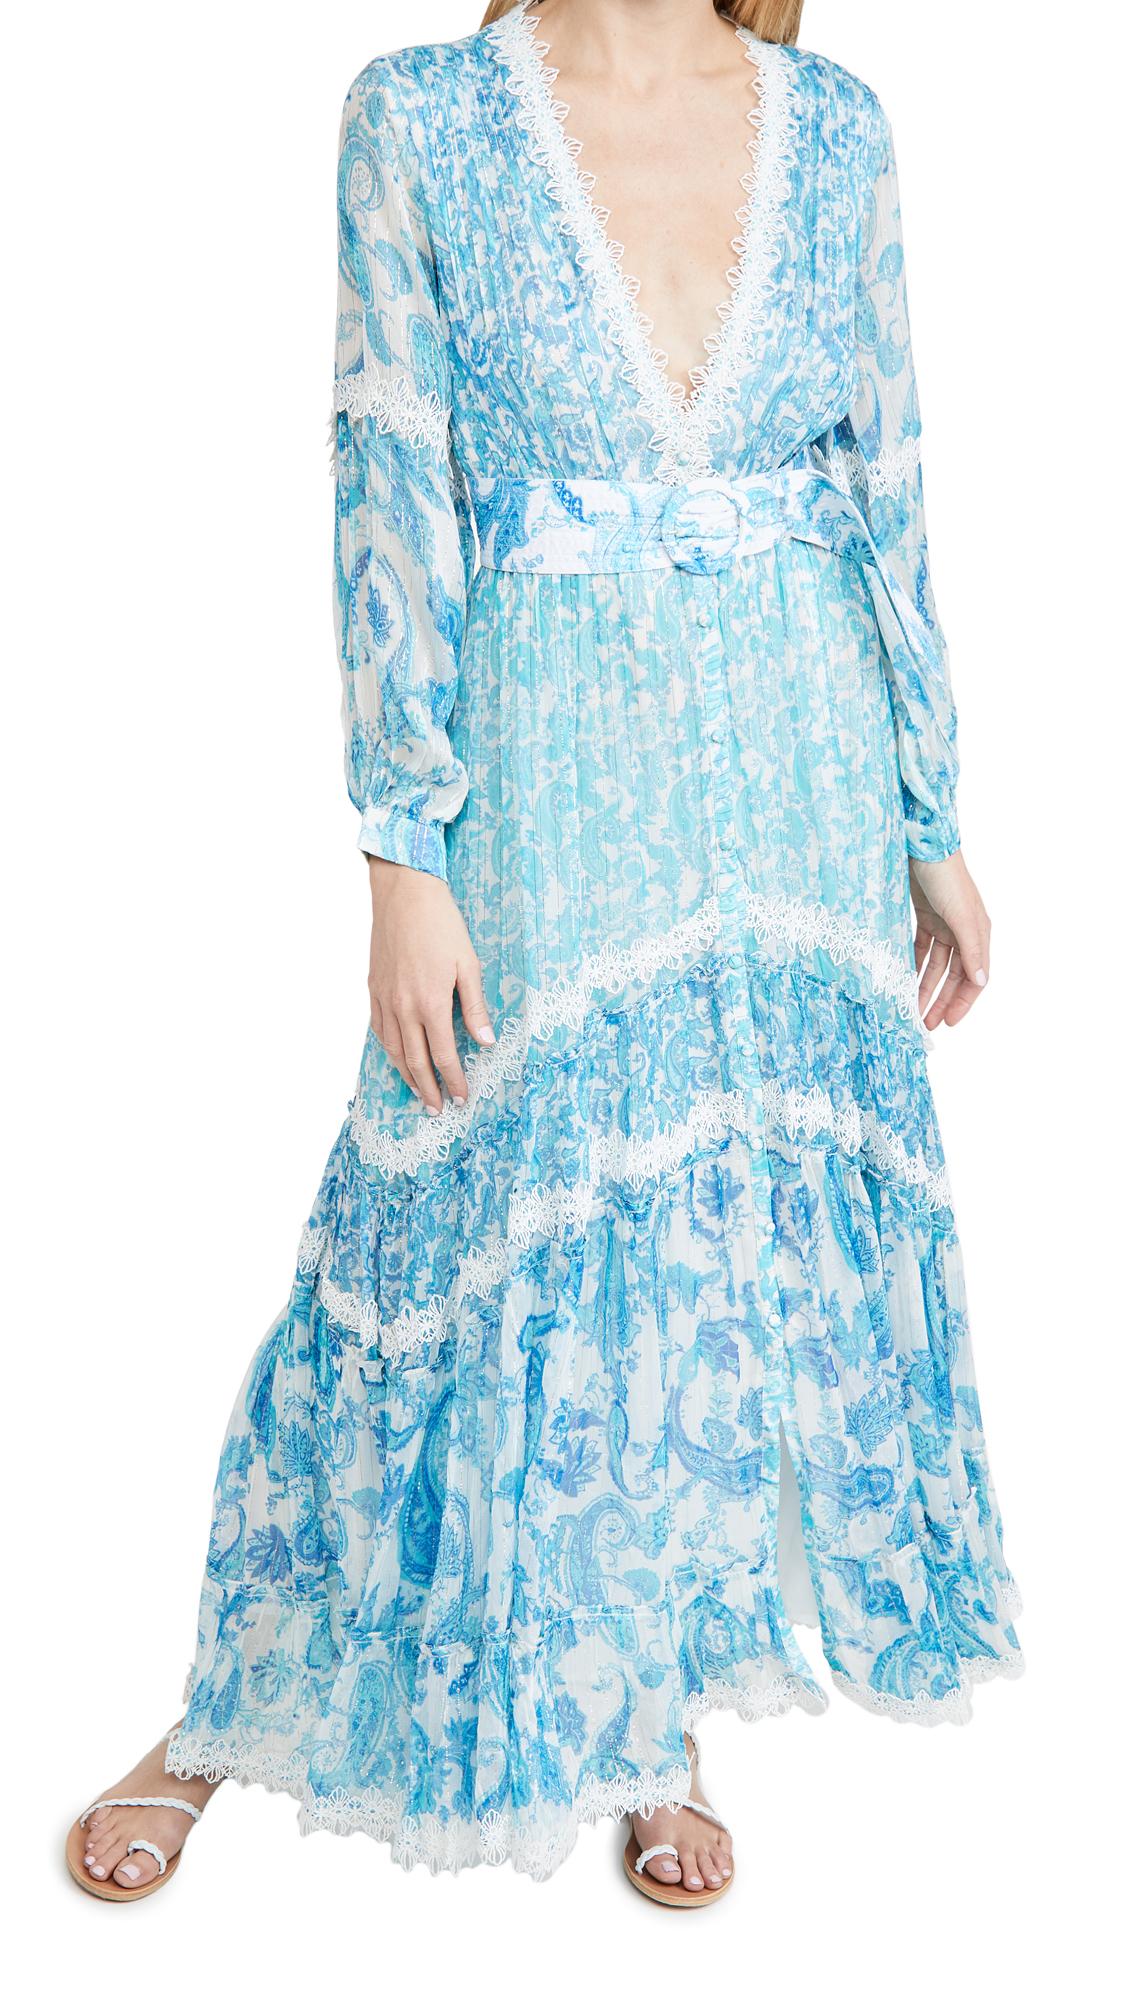 ROCOCO SAND V Neck Dress